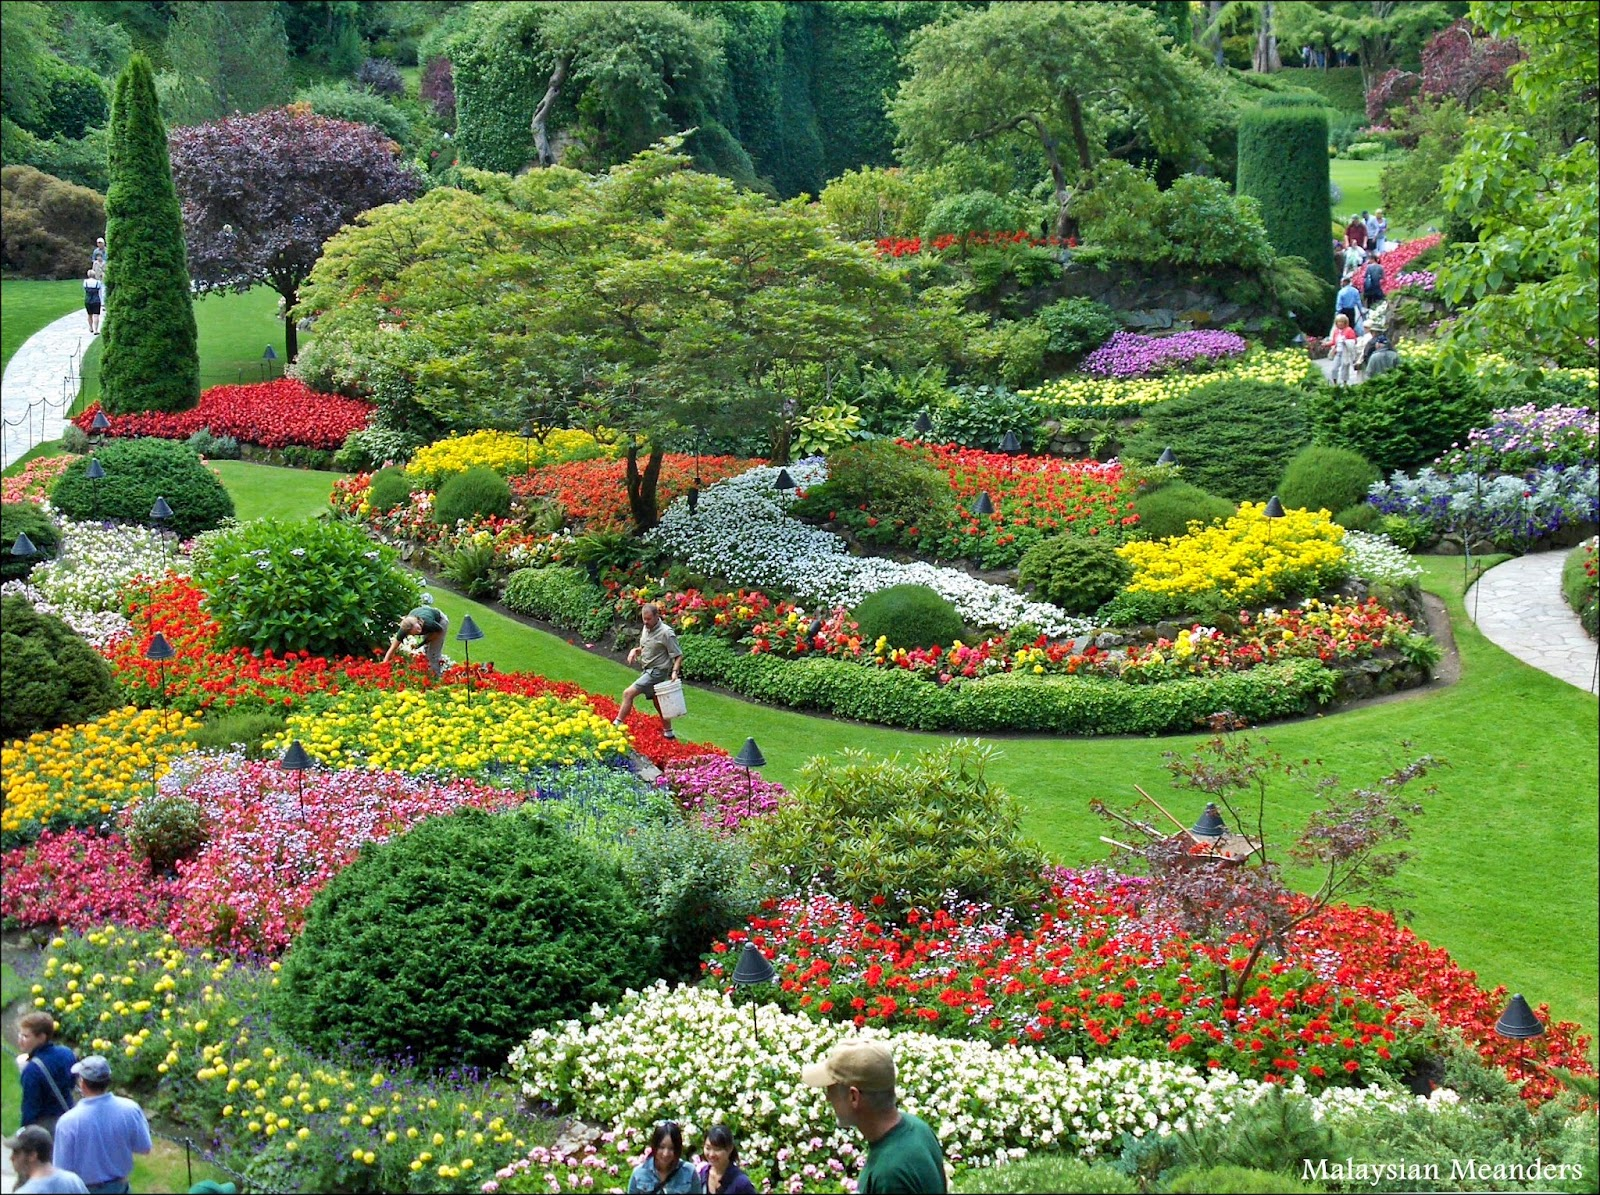 Malaysian Meanders Beauty And Renewal At Butchart Gardens